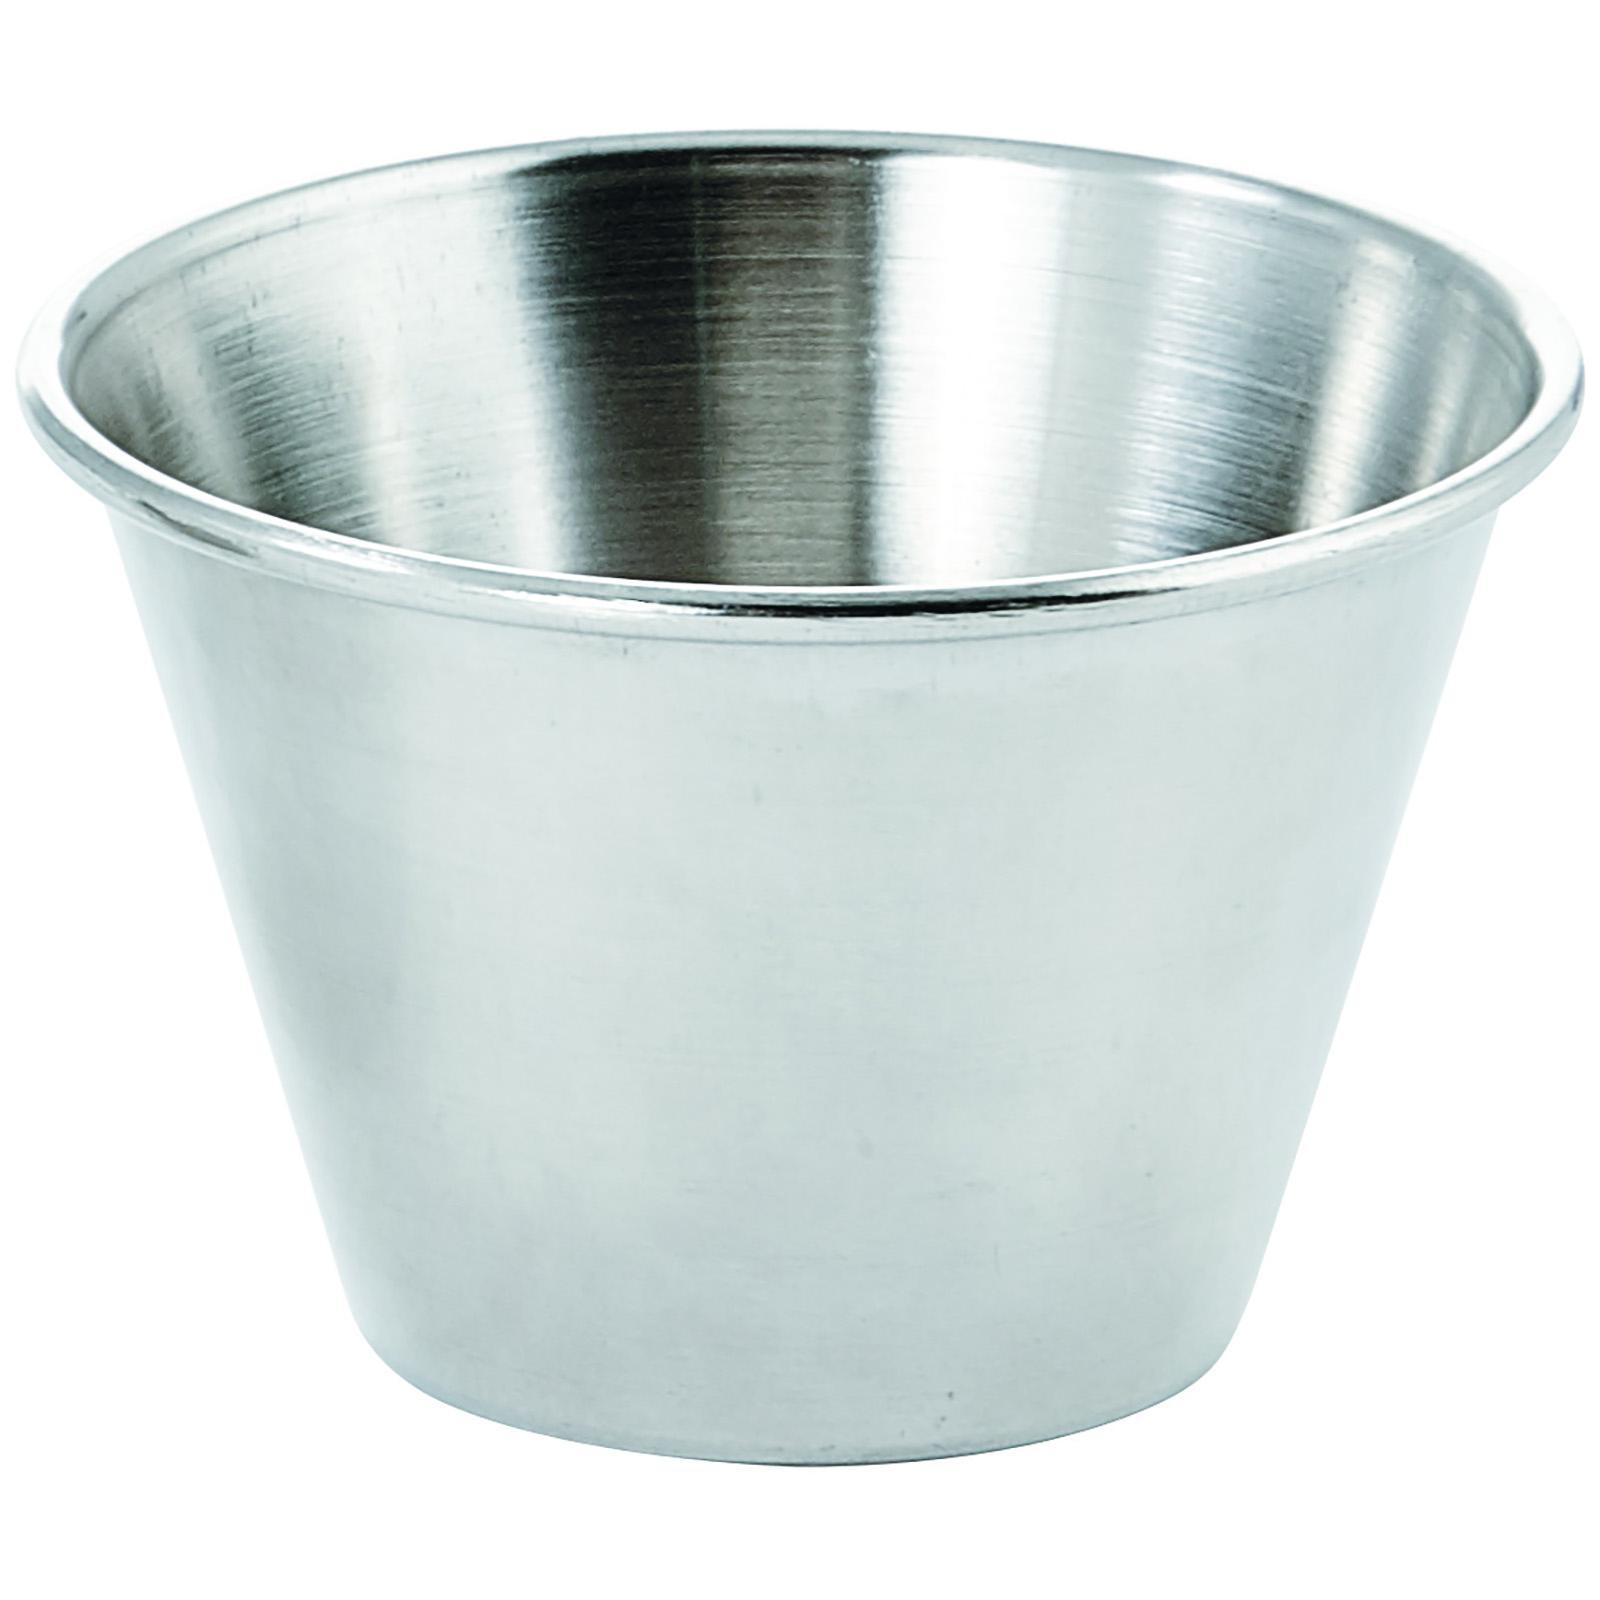 Winco SCP-40 ramekin / sauce cup, metal